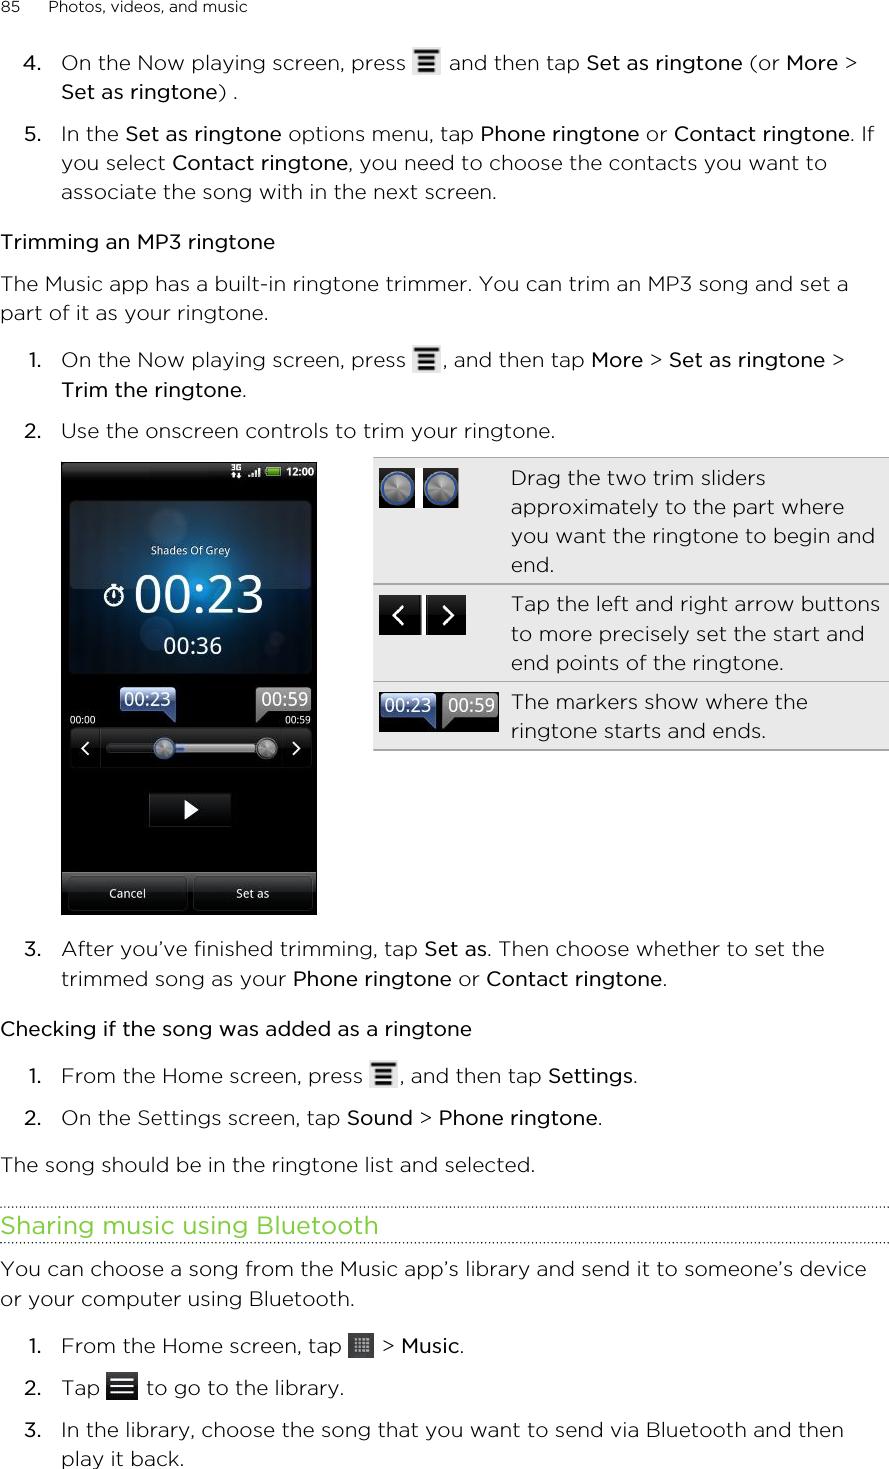 htc 10 user manual pdf